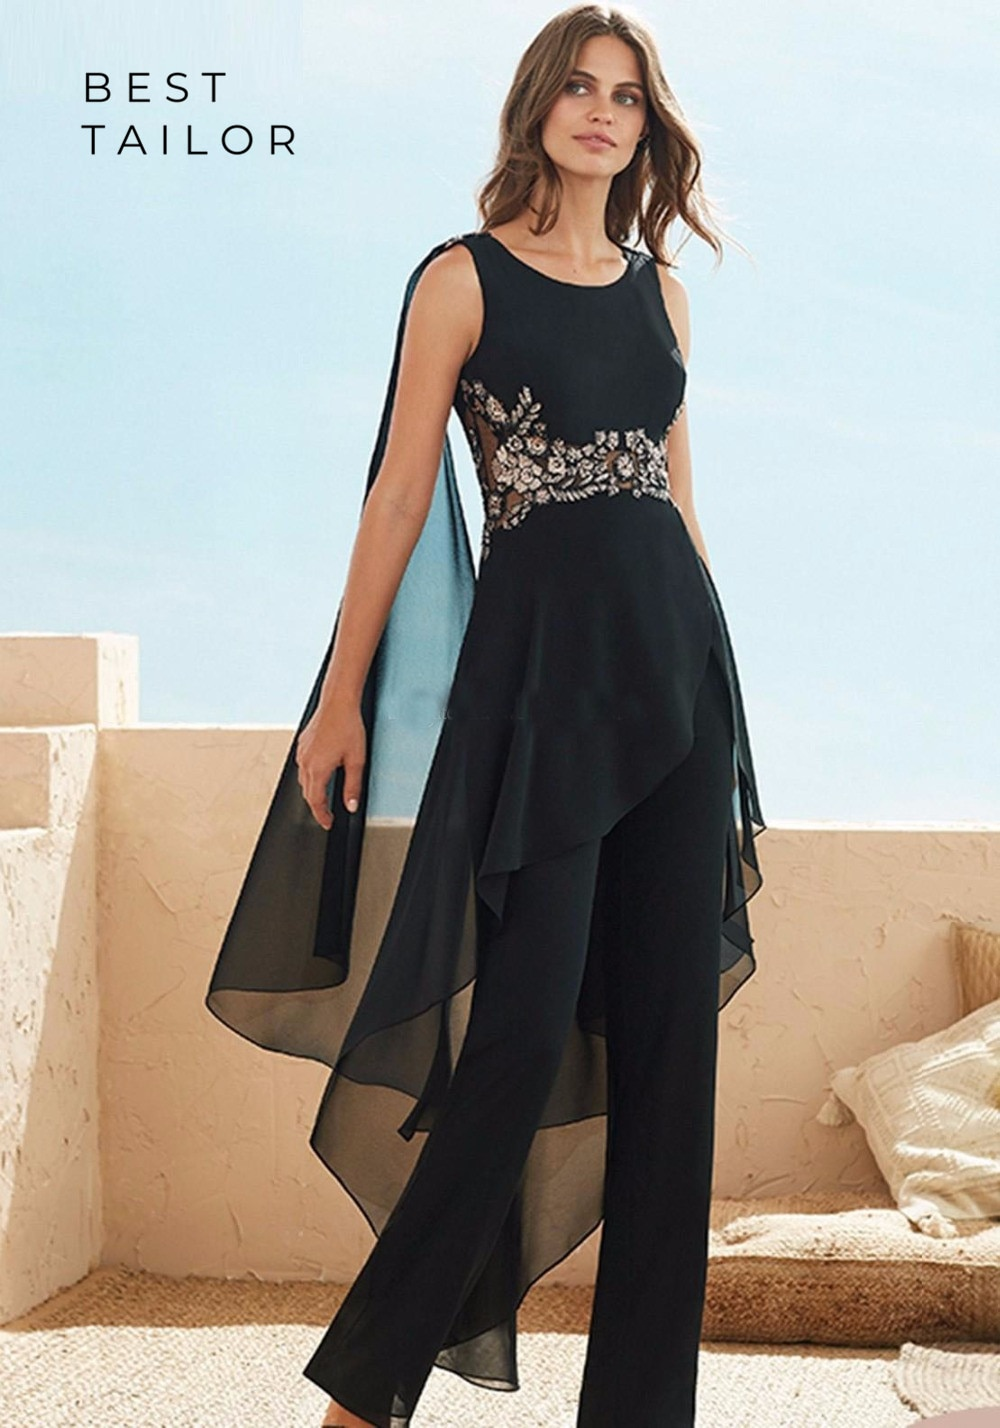 Madre de la novia/novio vestidos para mono para boda gasa negra Sin mangas drapeado mujeres modestas vestidos de noche formales Farsali